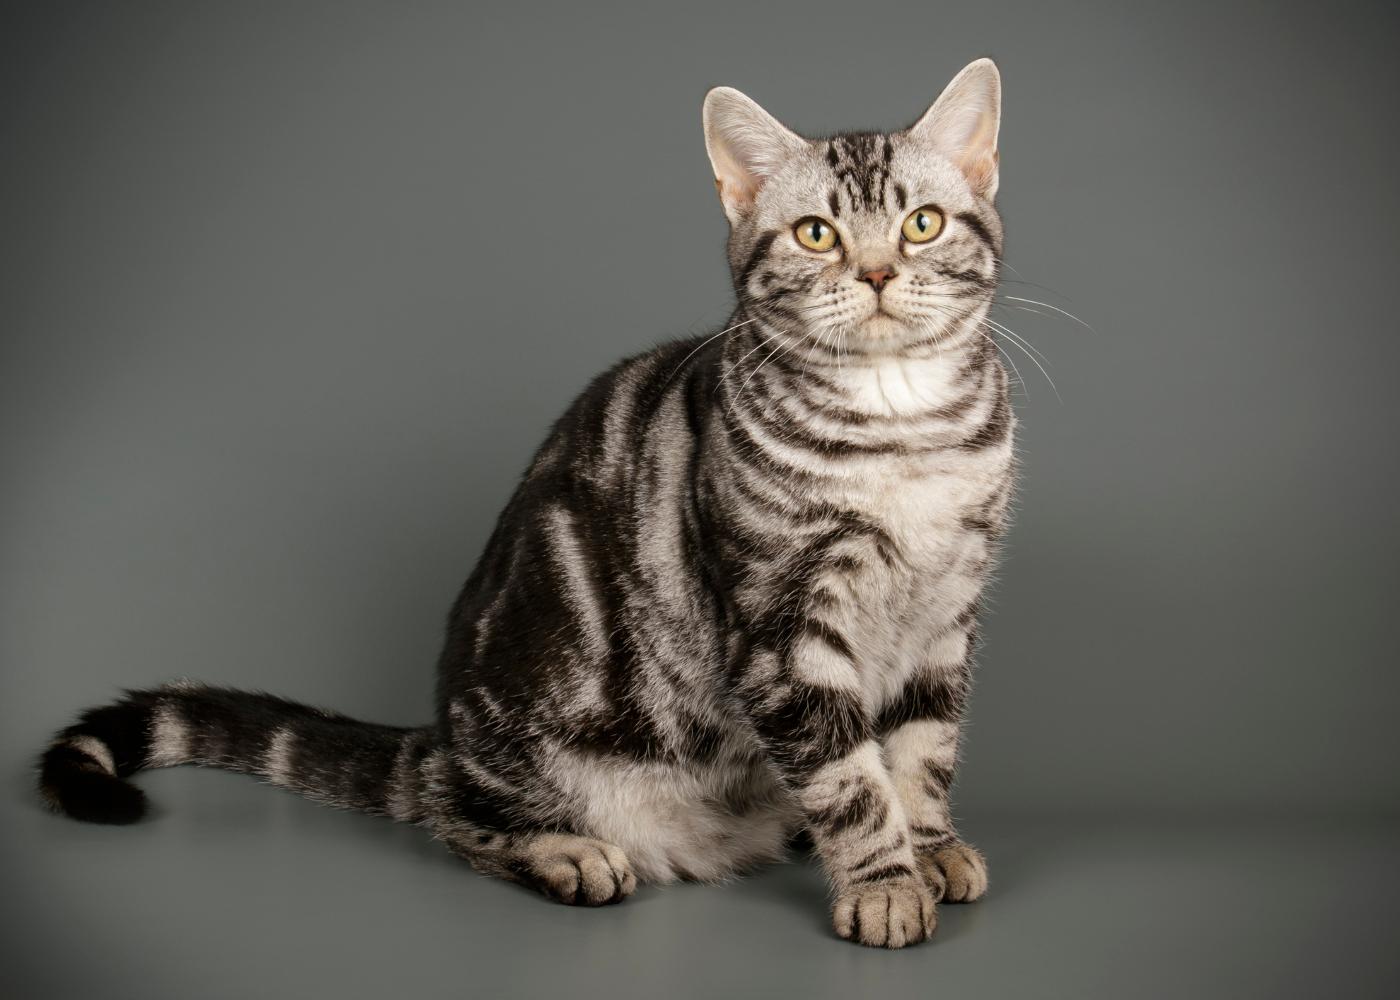 gato de pelo curto americano sentado